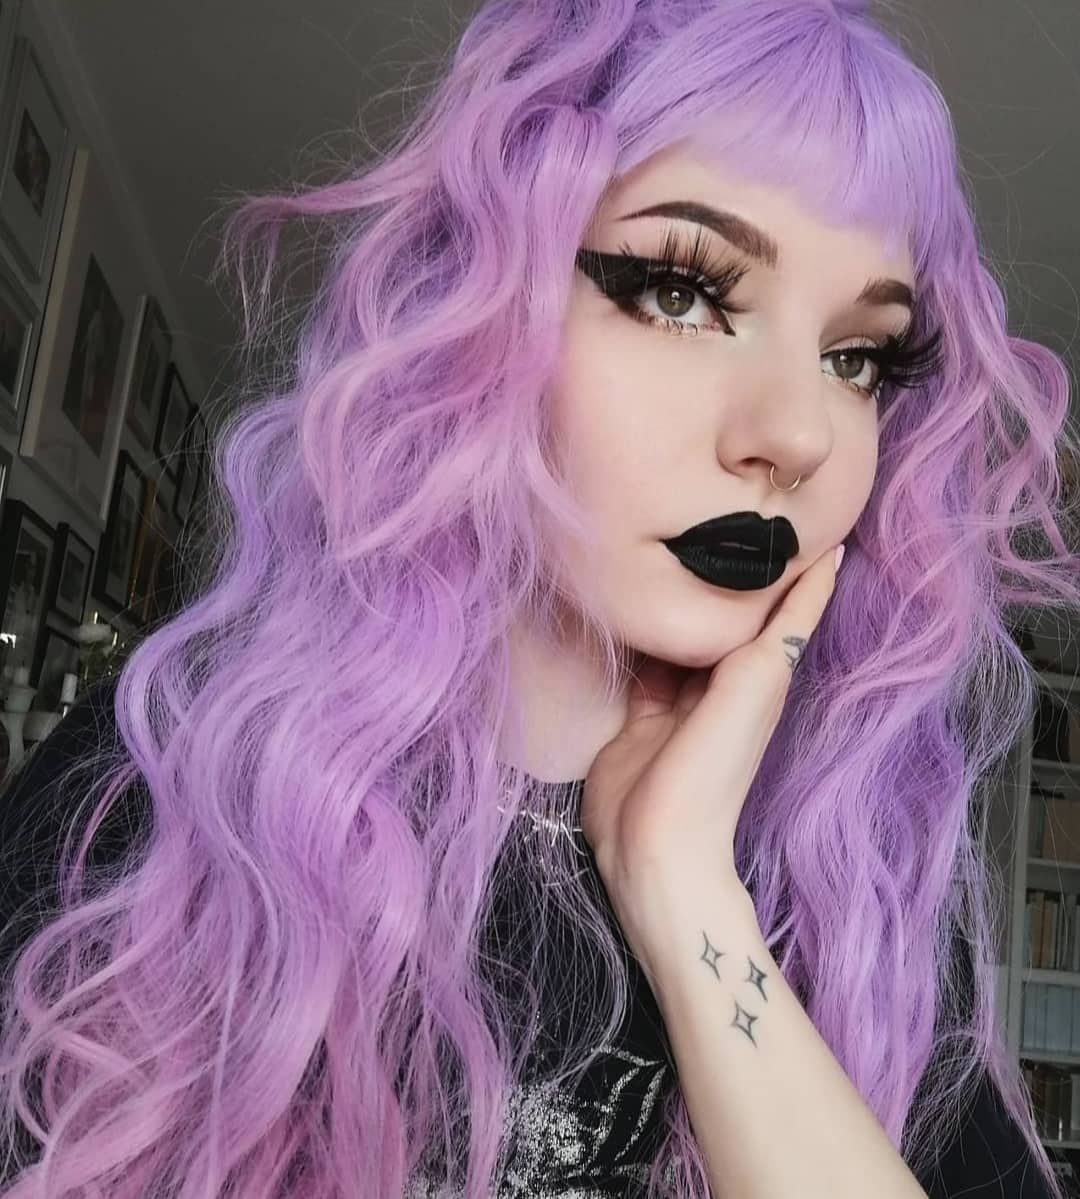 Pin By Abha On Egirl Aesthetic In 2020 Purple Hair Wigs Full Makeup